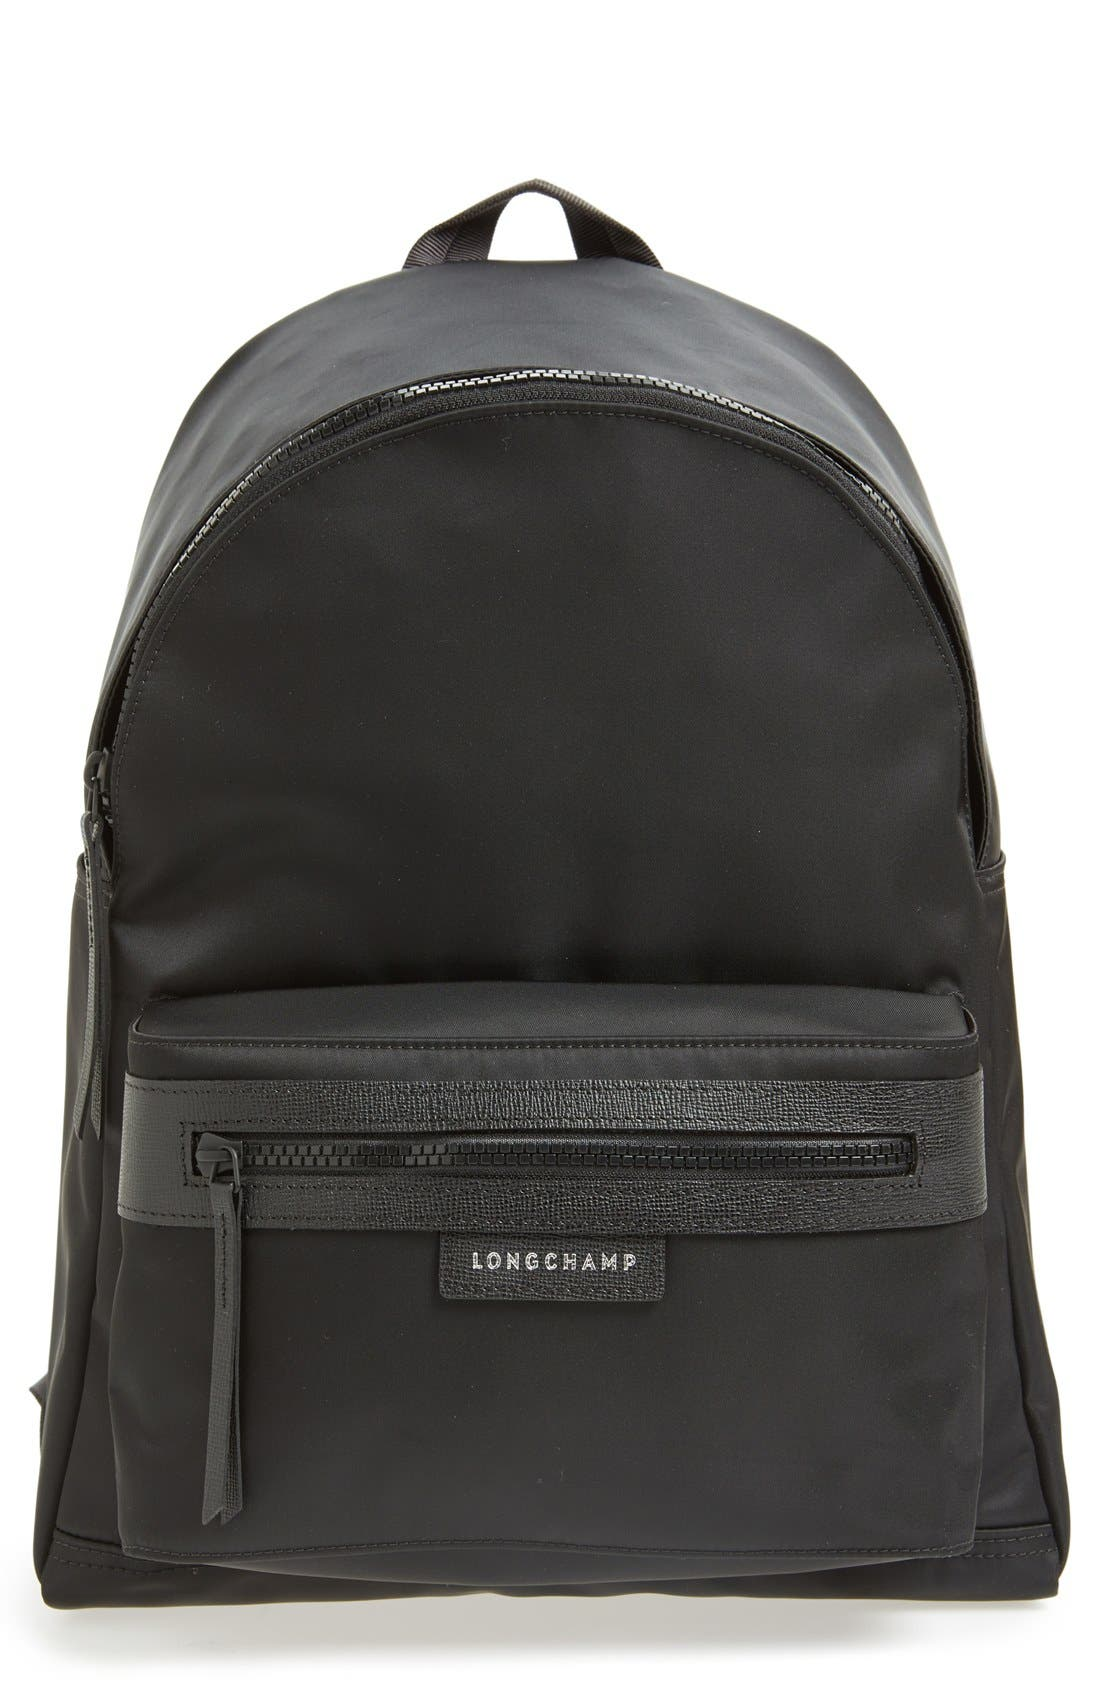 Alternate Image 1 Selected - Longchamp 'Le Pliage Neo' Nylon Backpack